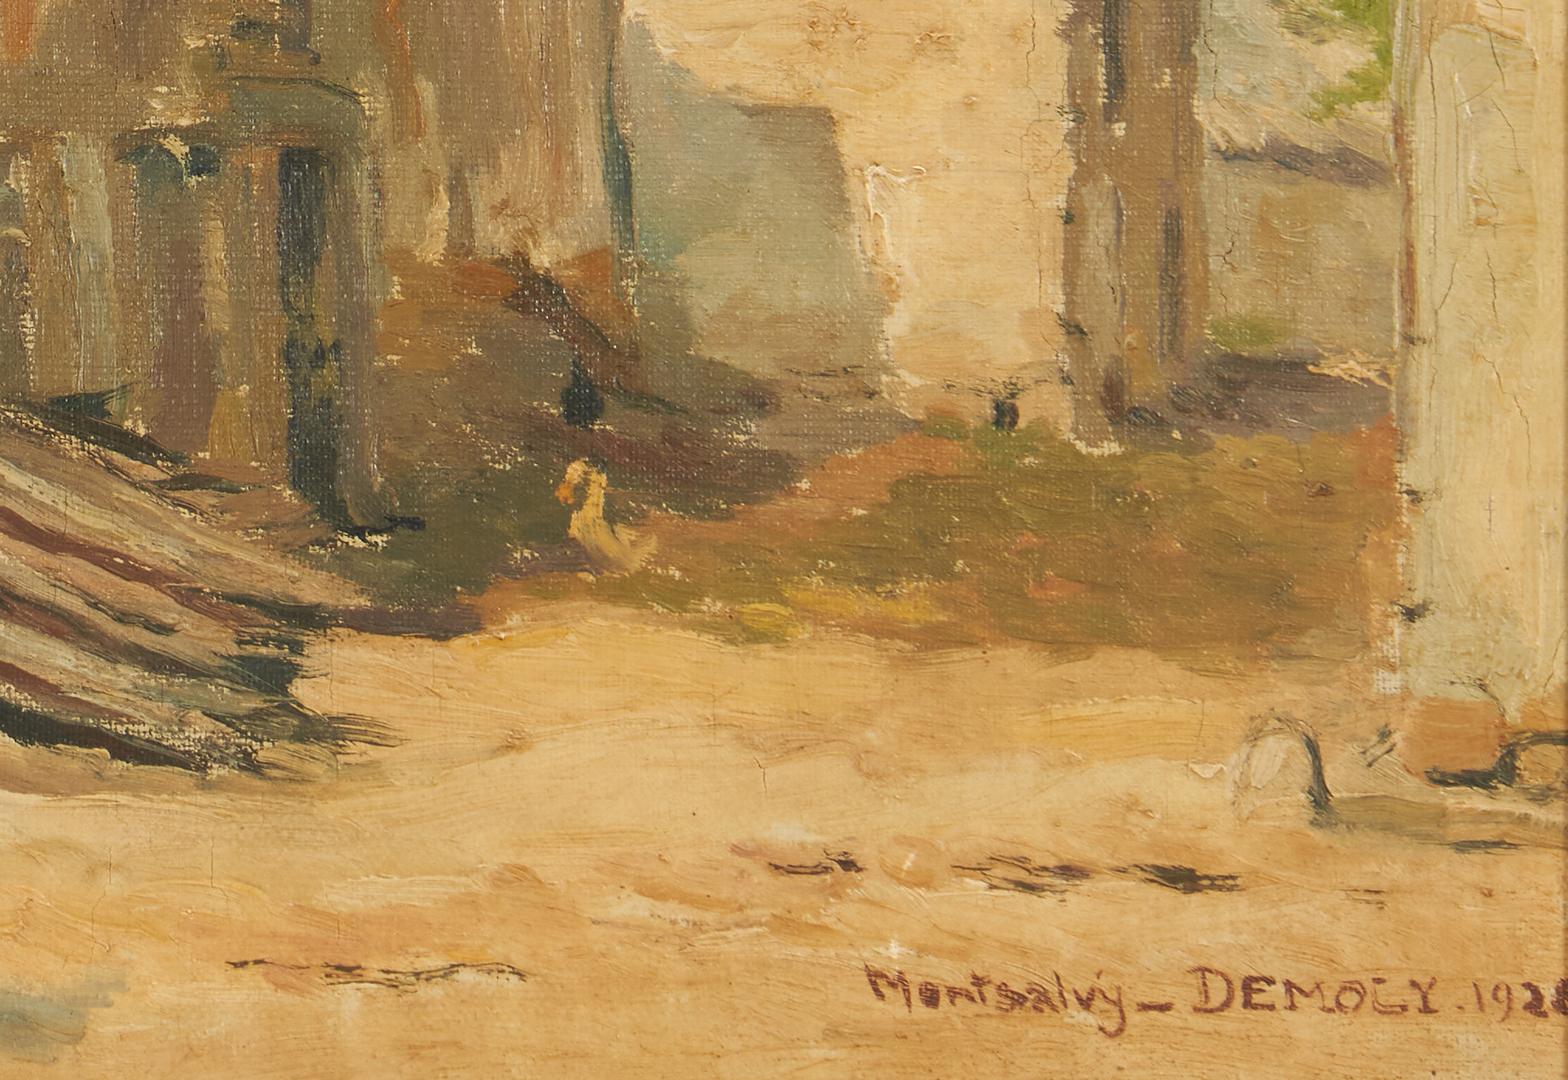 Lot 1020: Continental School O/C Landscape, Montsalvy